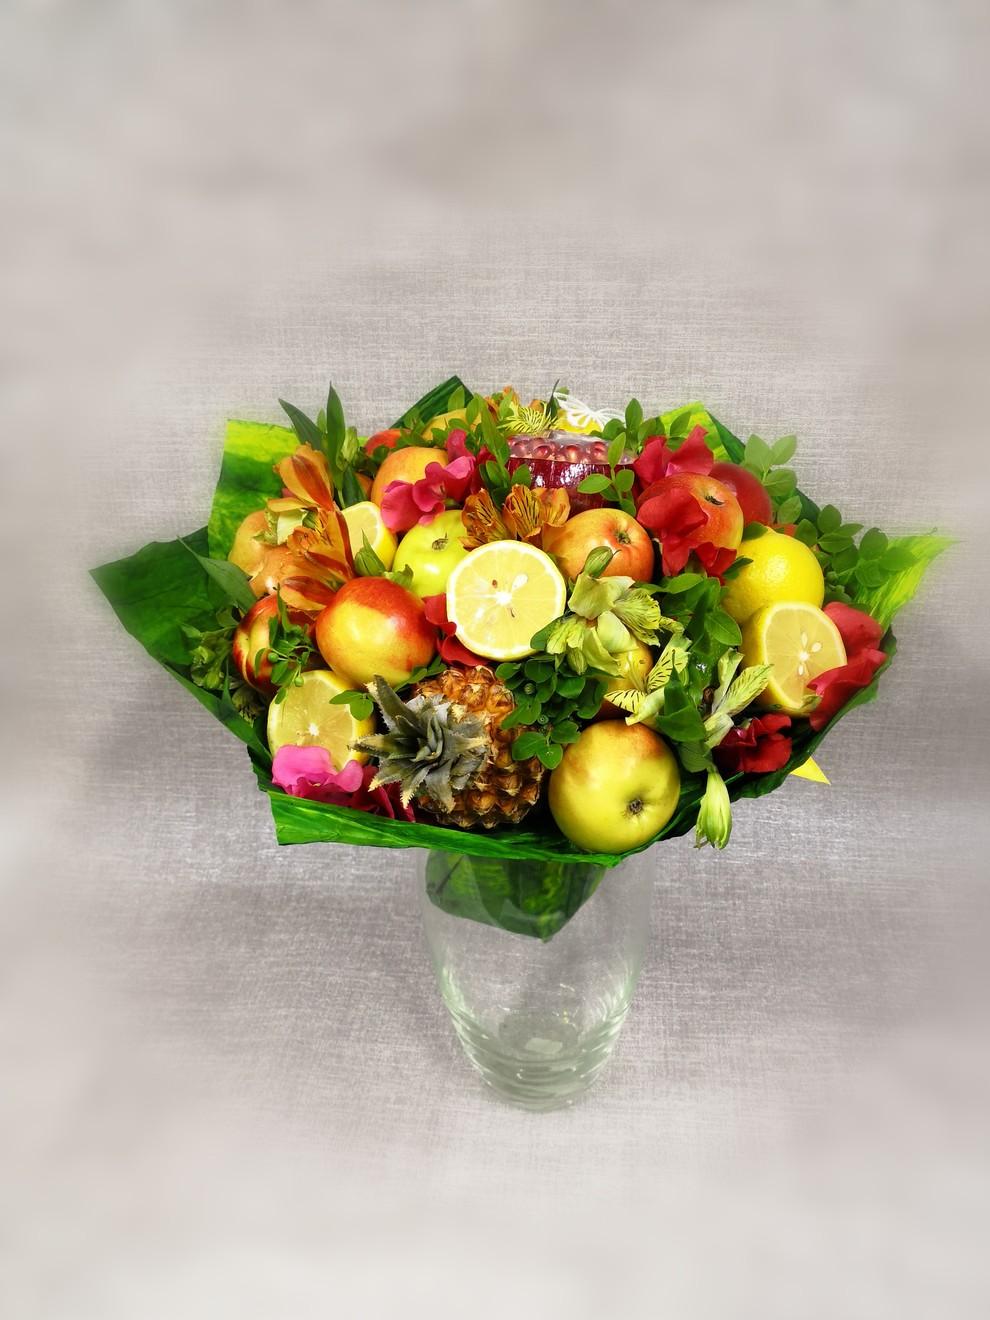 Доставка цветов в озерске челябинской, доставка цветов